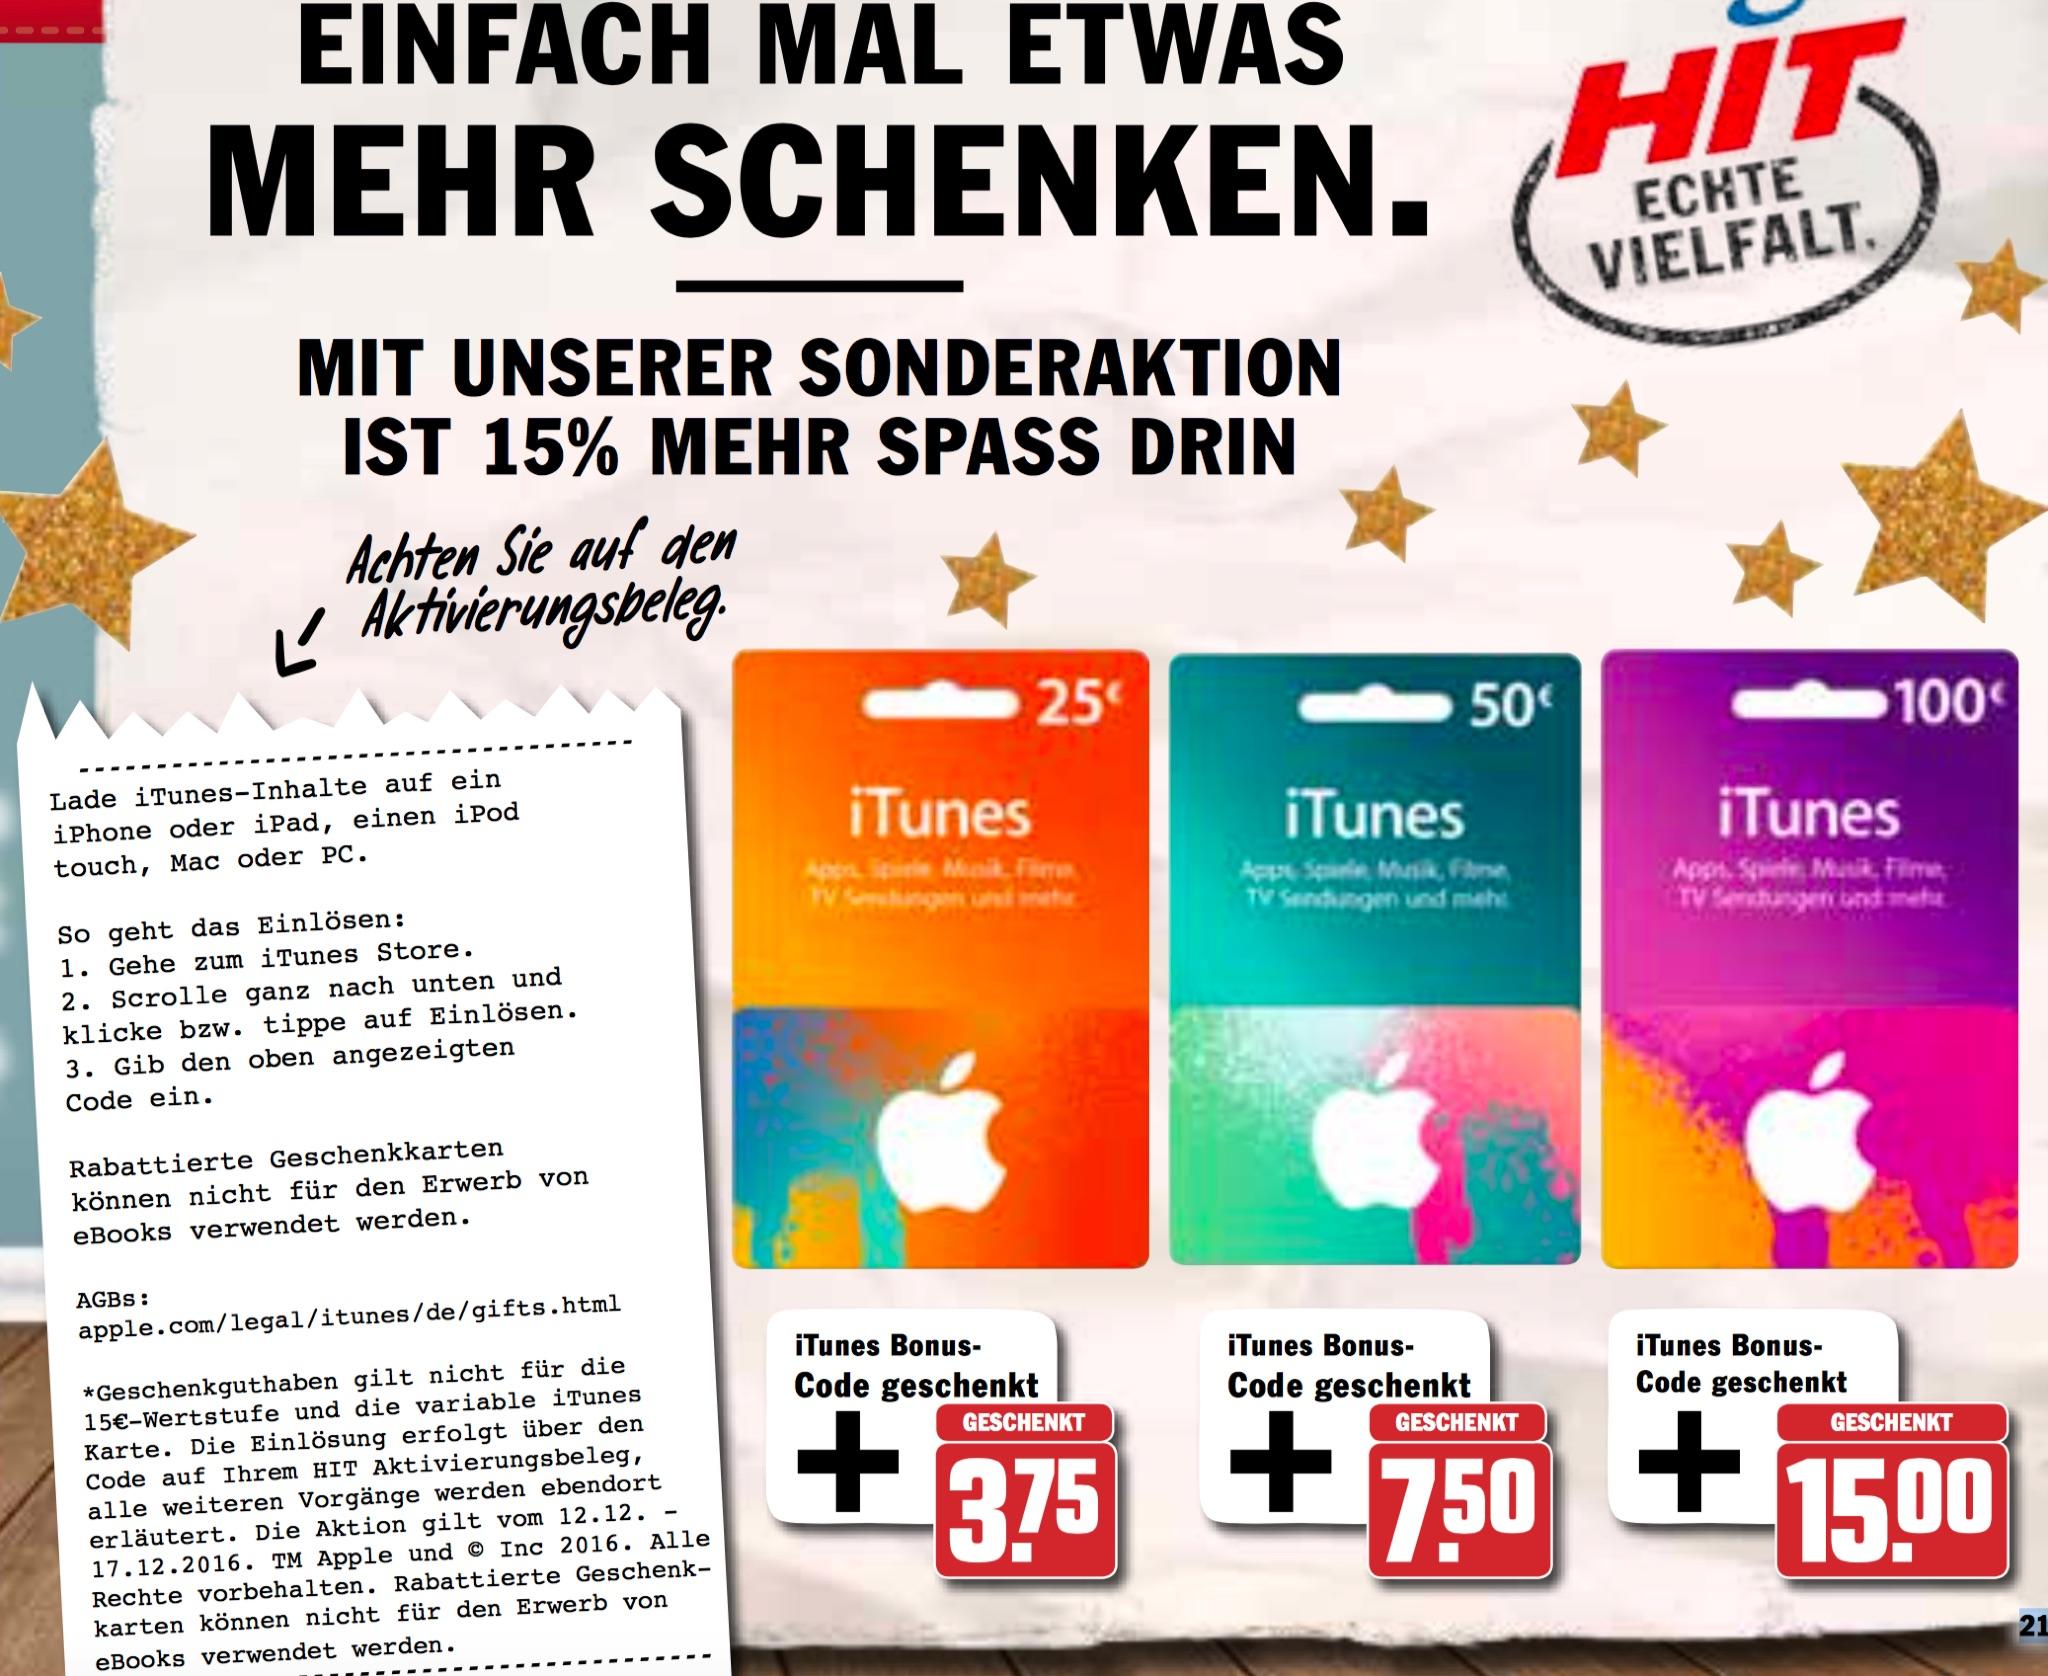 Itunes Karten Rabatt Bei Hit Müller Und Medimax Macerkopf